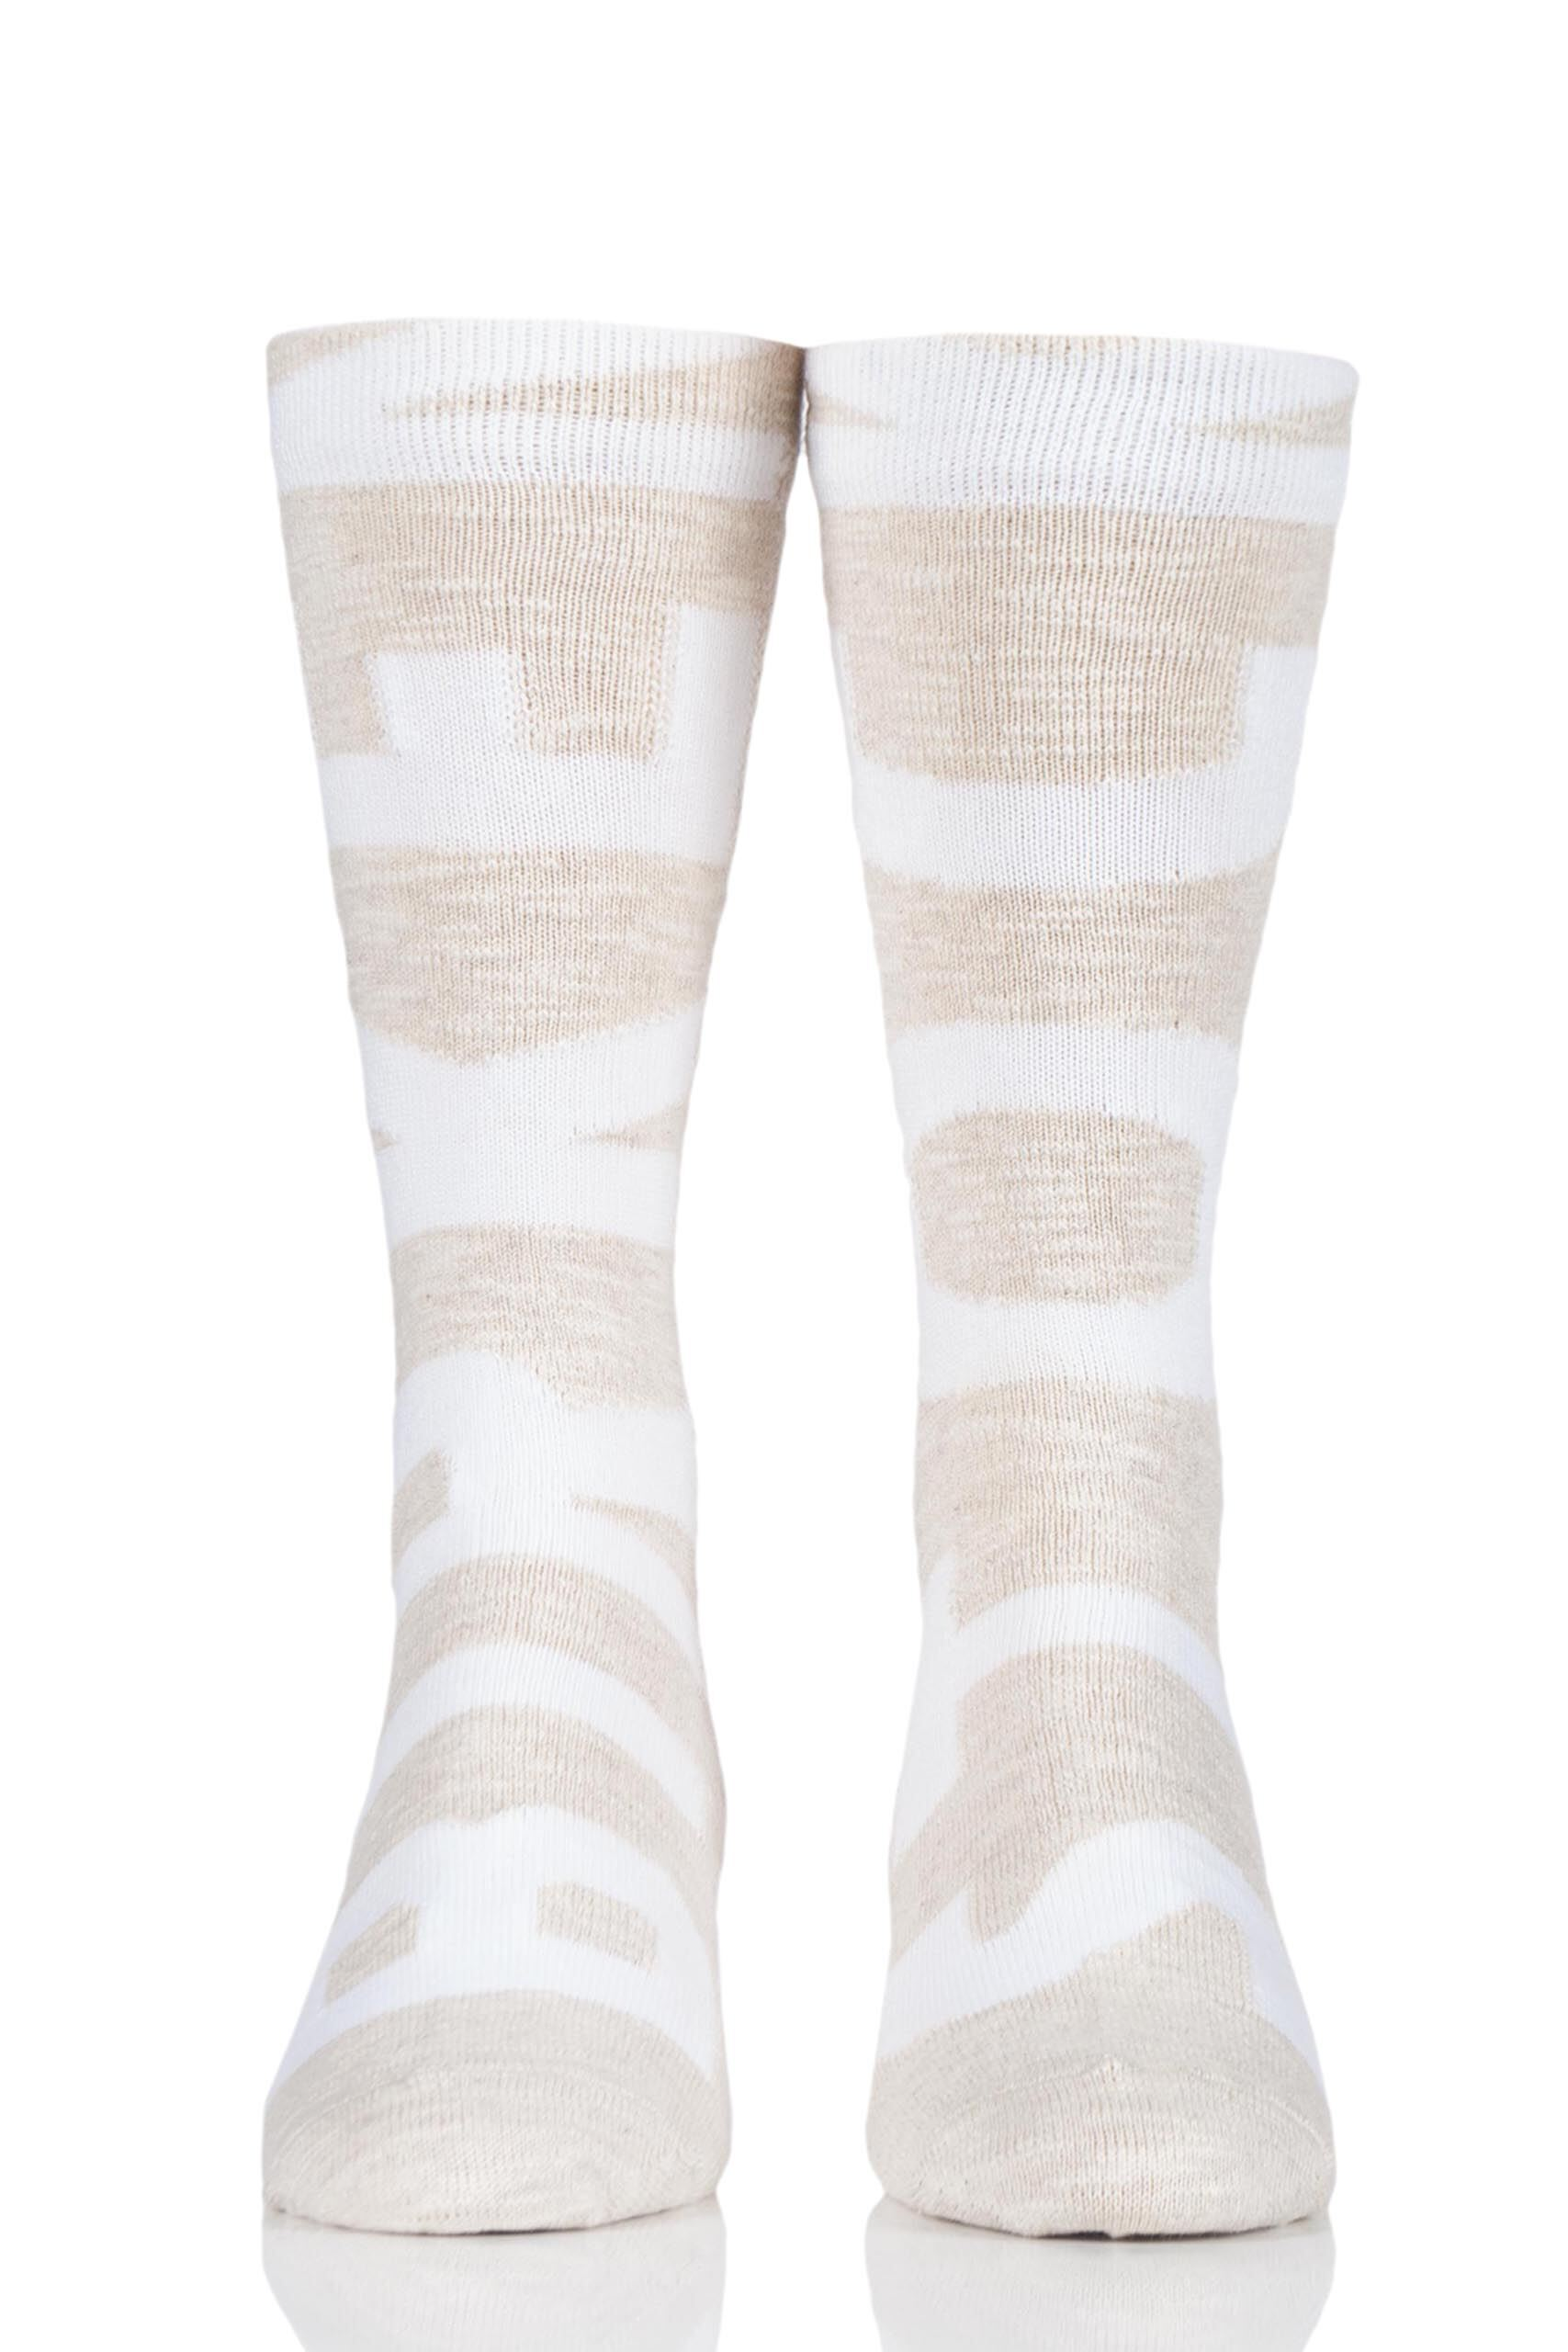 Image of 1 Pair Beige Sub Logo Cotton Socks Men's 10.5-12 Mens - Birkenstock